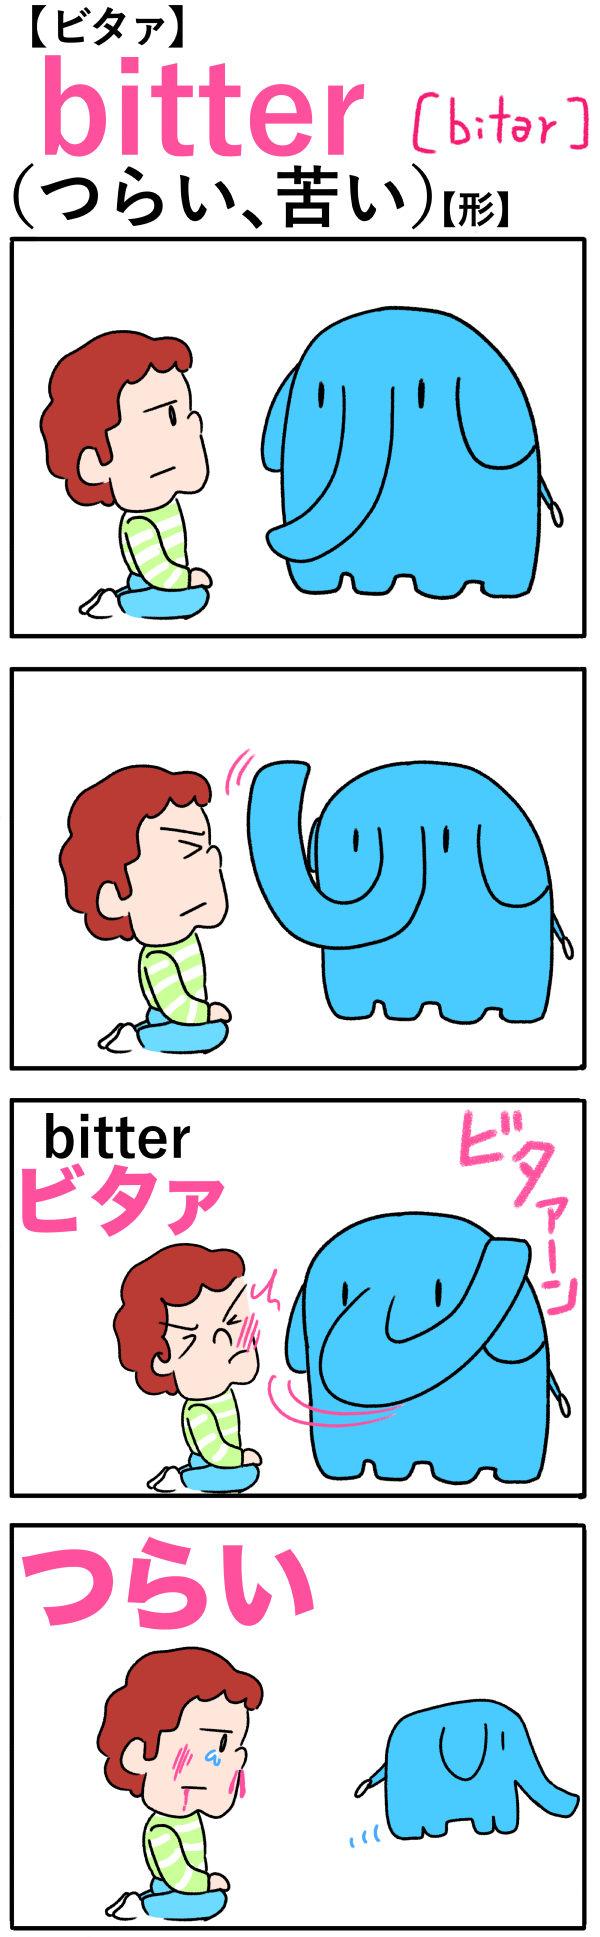 bitter(つらい、苦しい)の語呂合わせ英単語